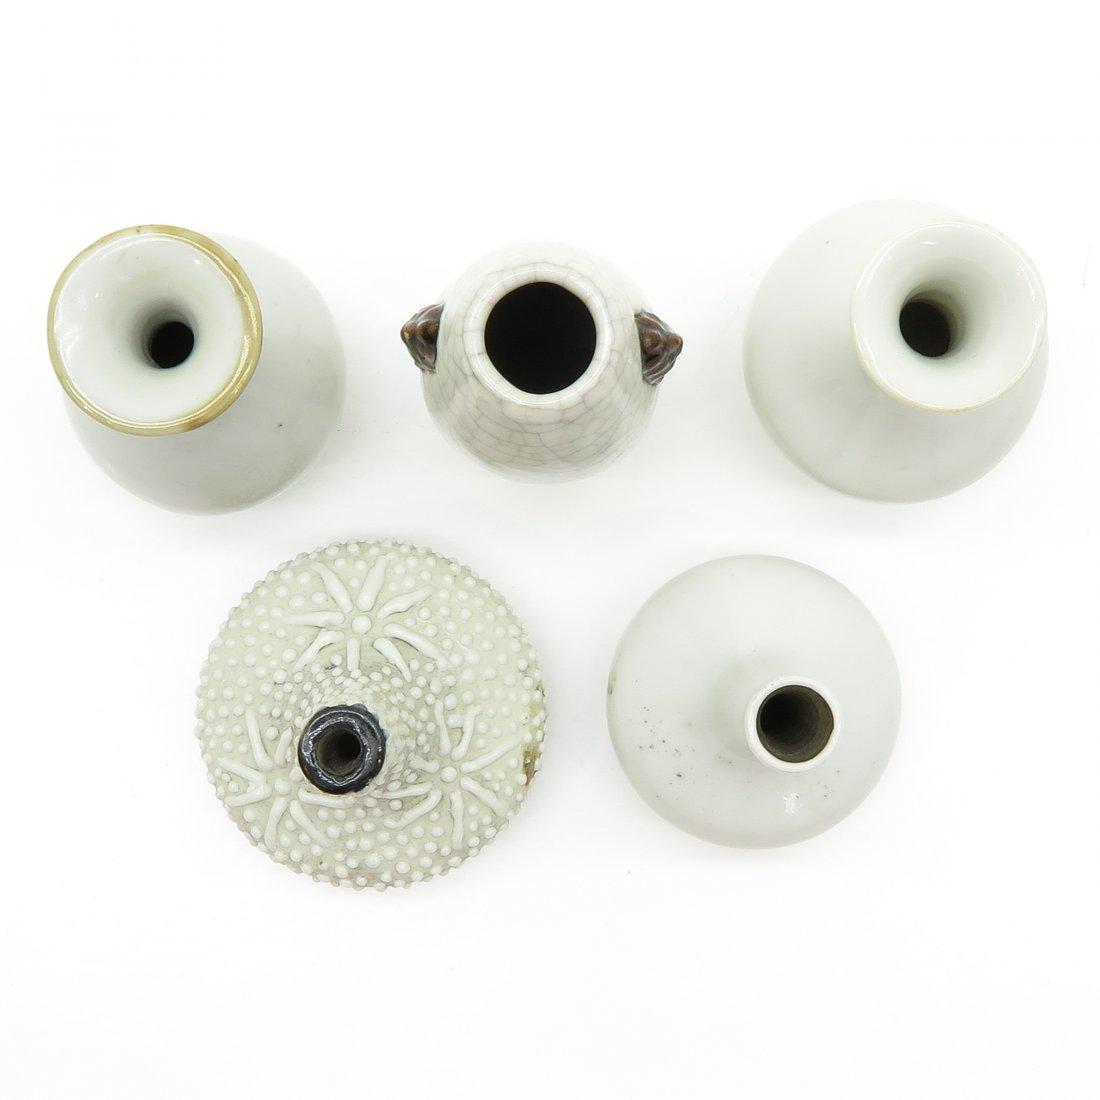 Lot of 5 China Porcelain Miniature Vases - 5